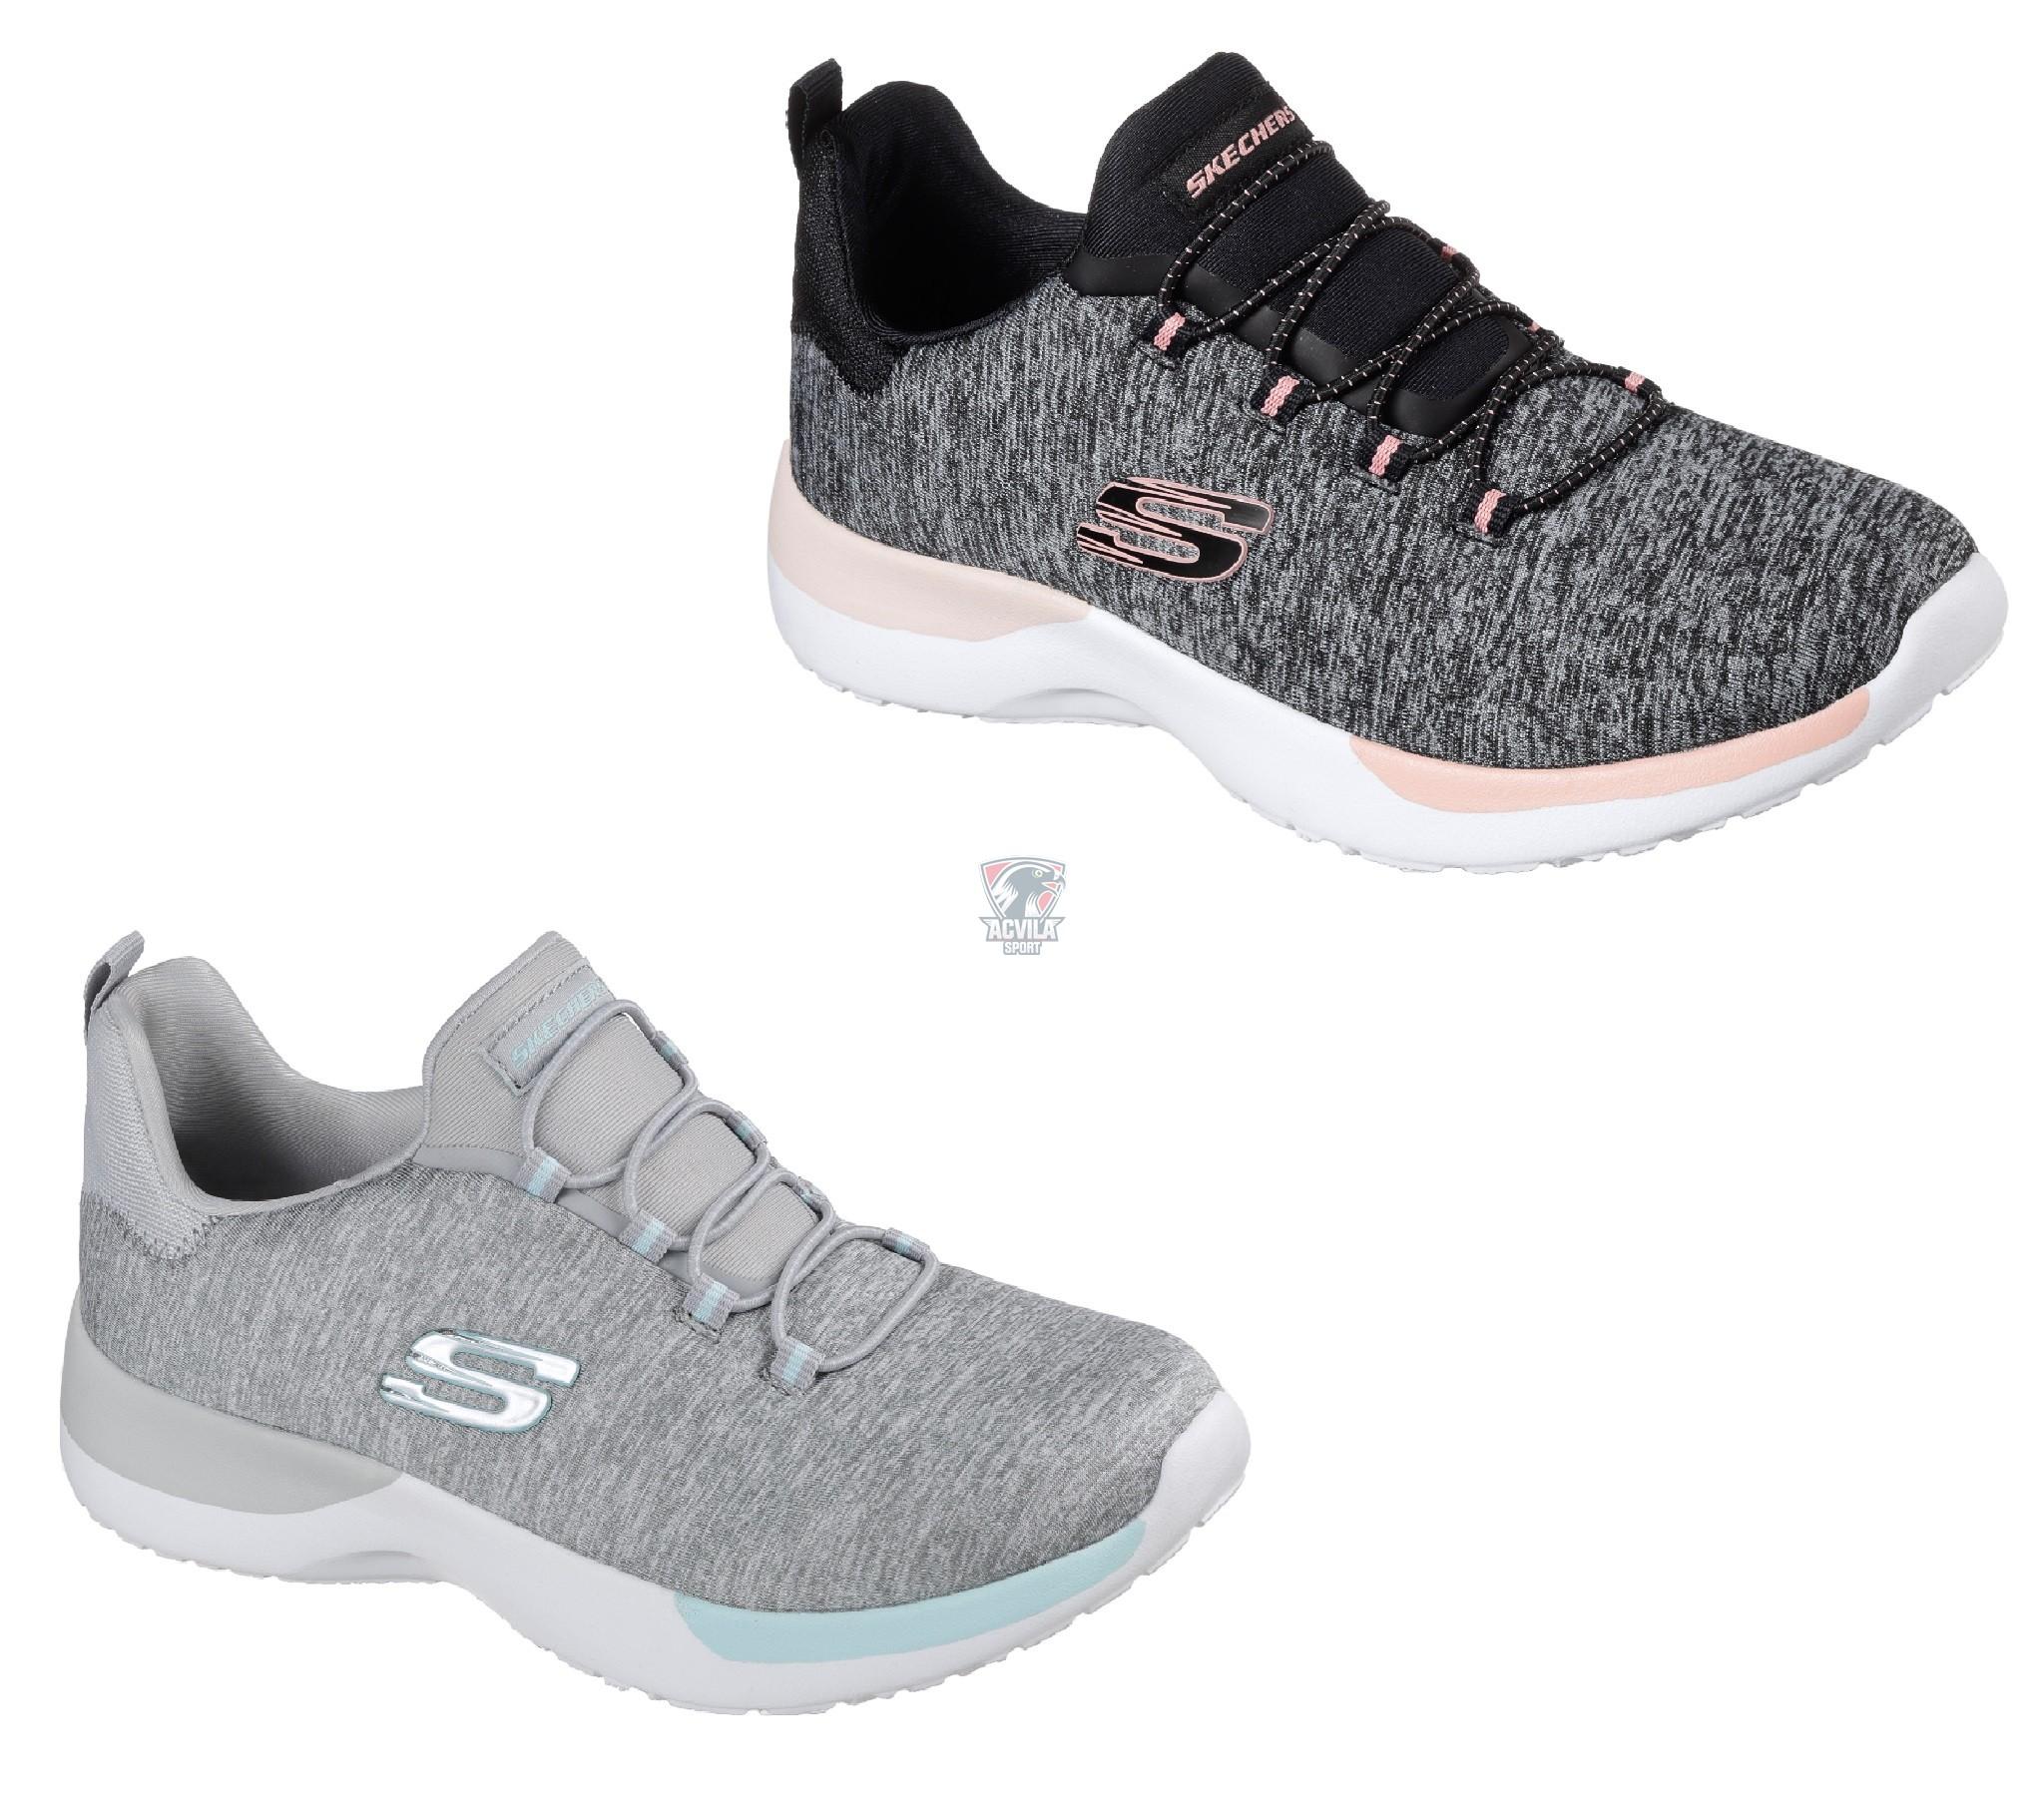 Photo acvilasport - Женская спортивная обувь SKECHERS DYNAMIGHT - BREAKTHROUGH